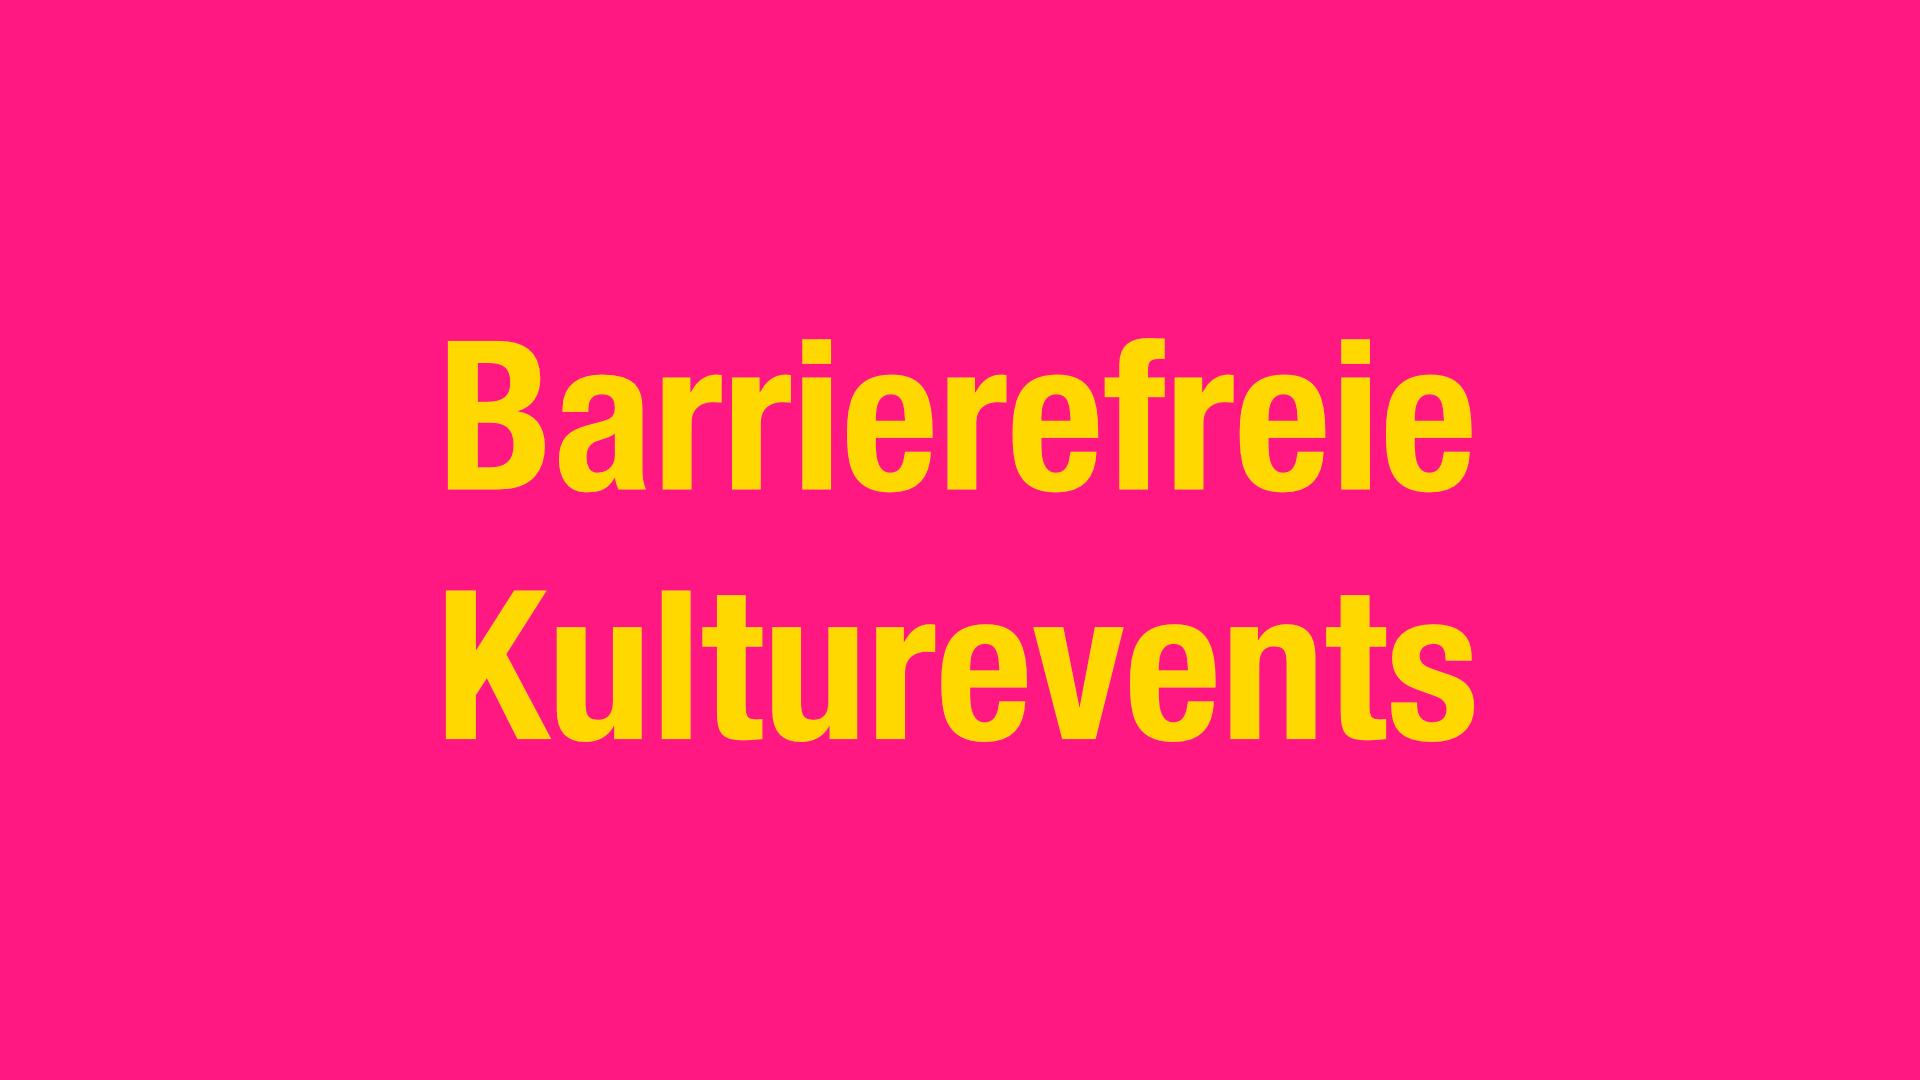 Barrierefreie Kulturevents